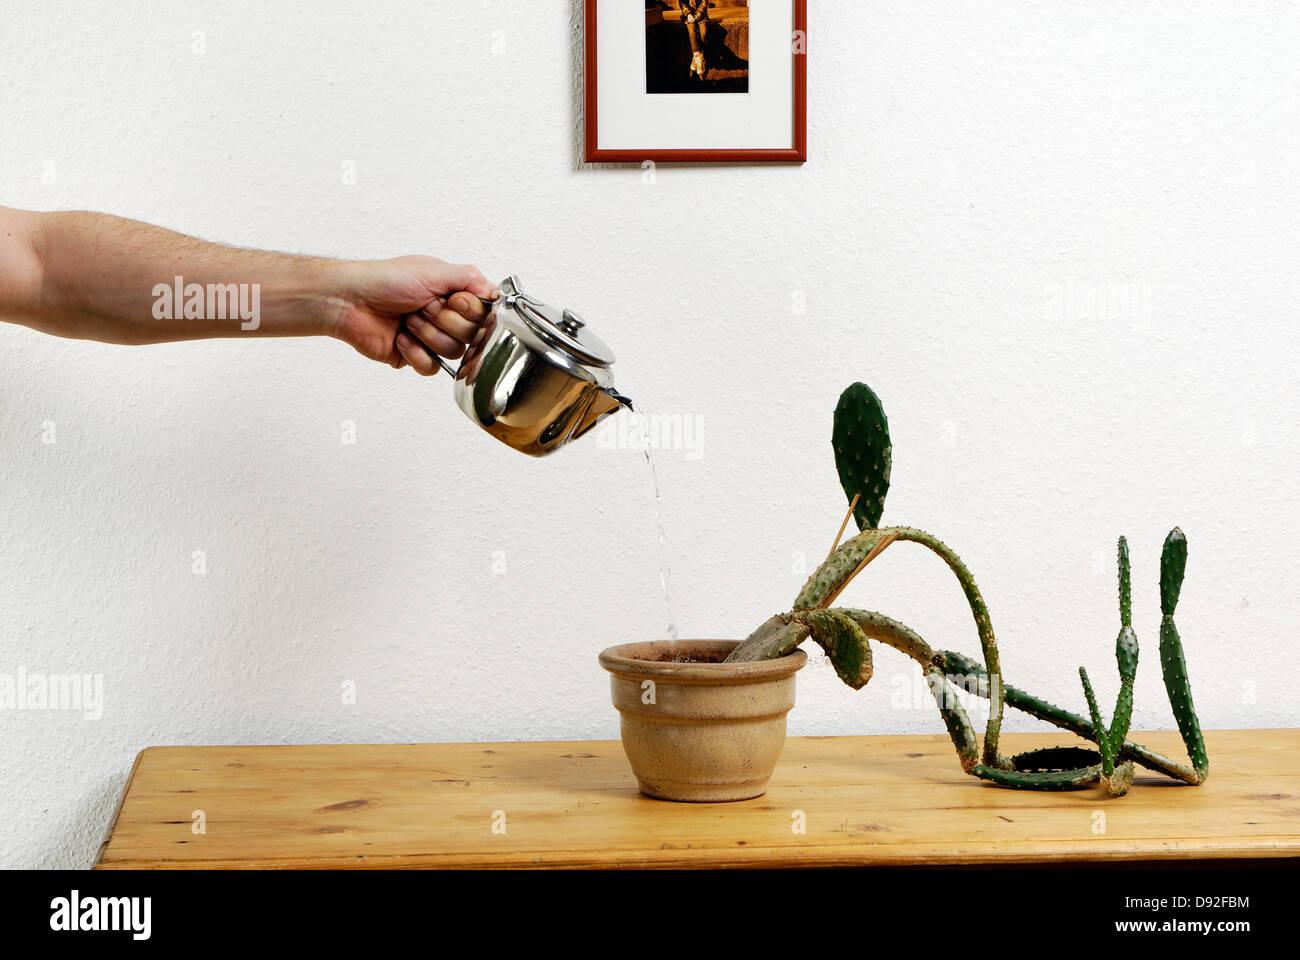 Ein Kaktus auf einem Brett Stockbild